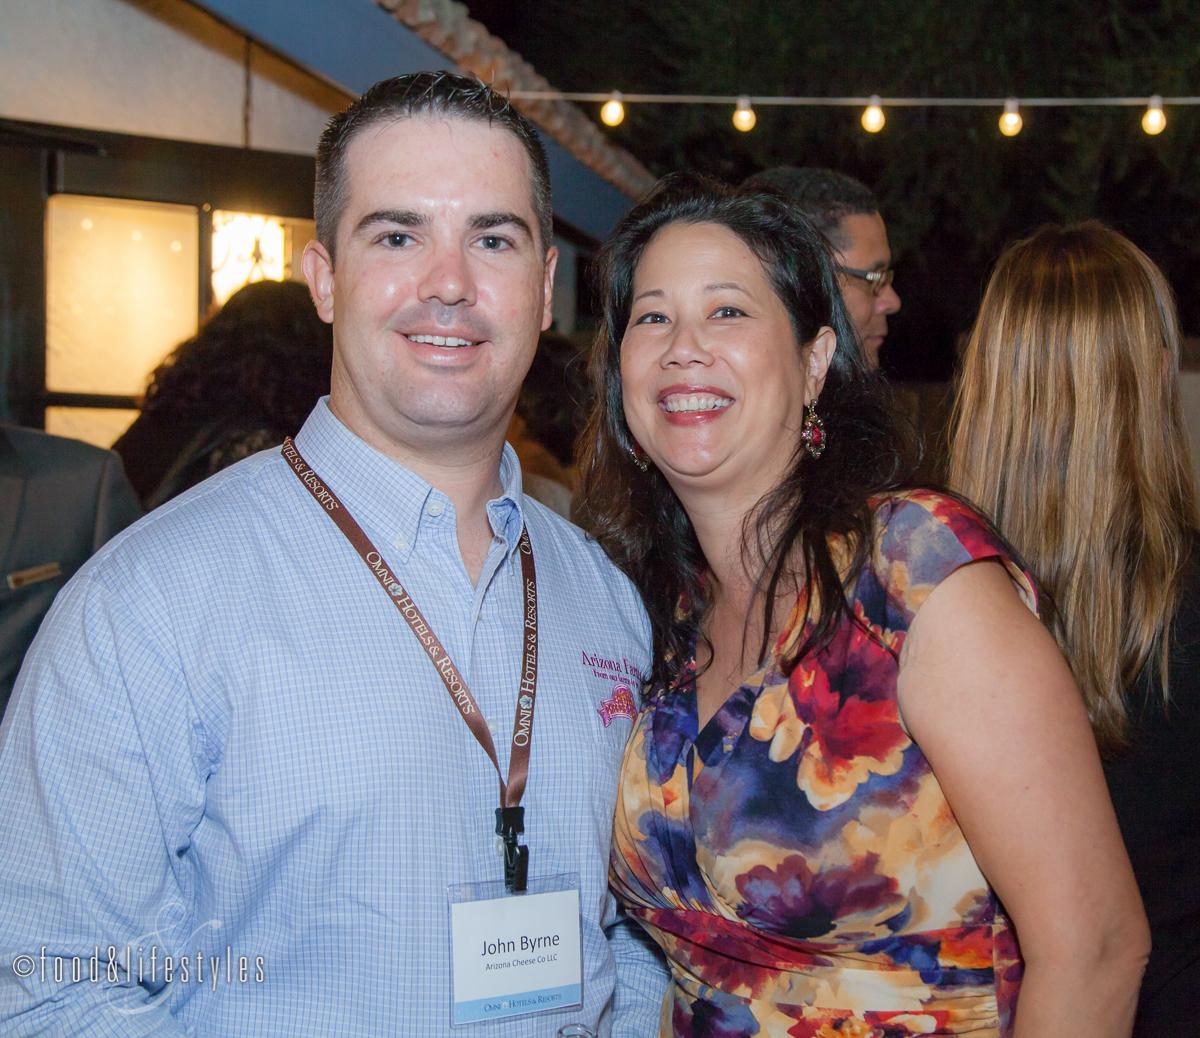 With John Byrne of the Arizona Cheese Company